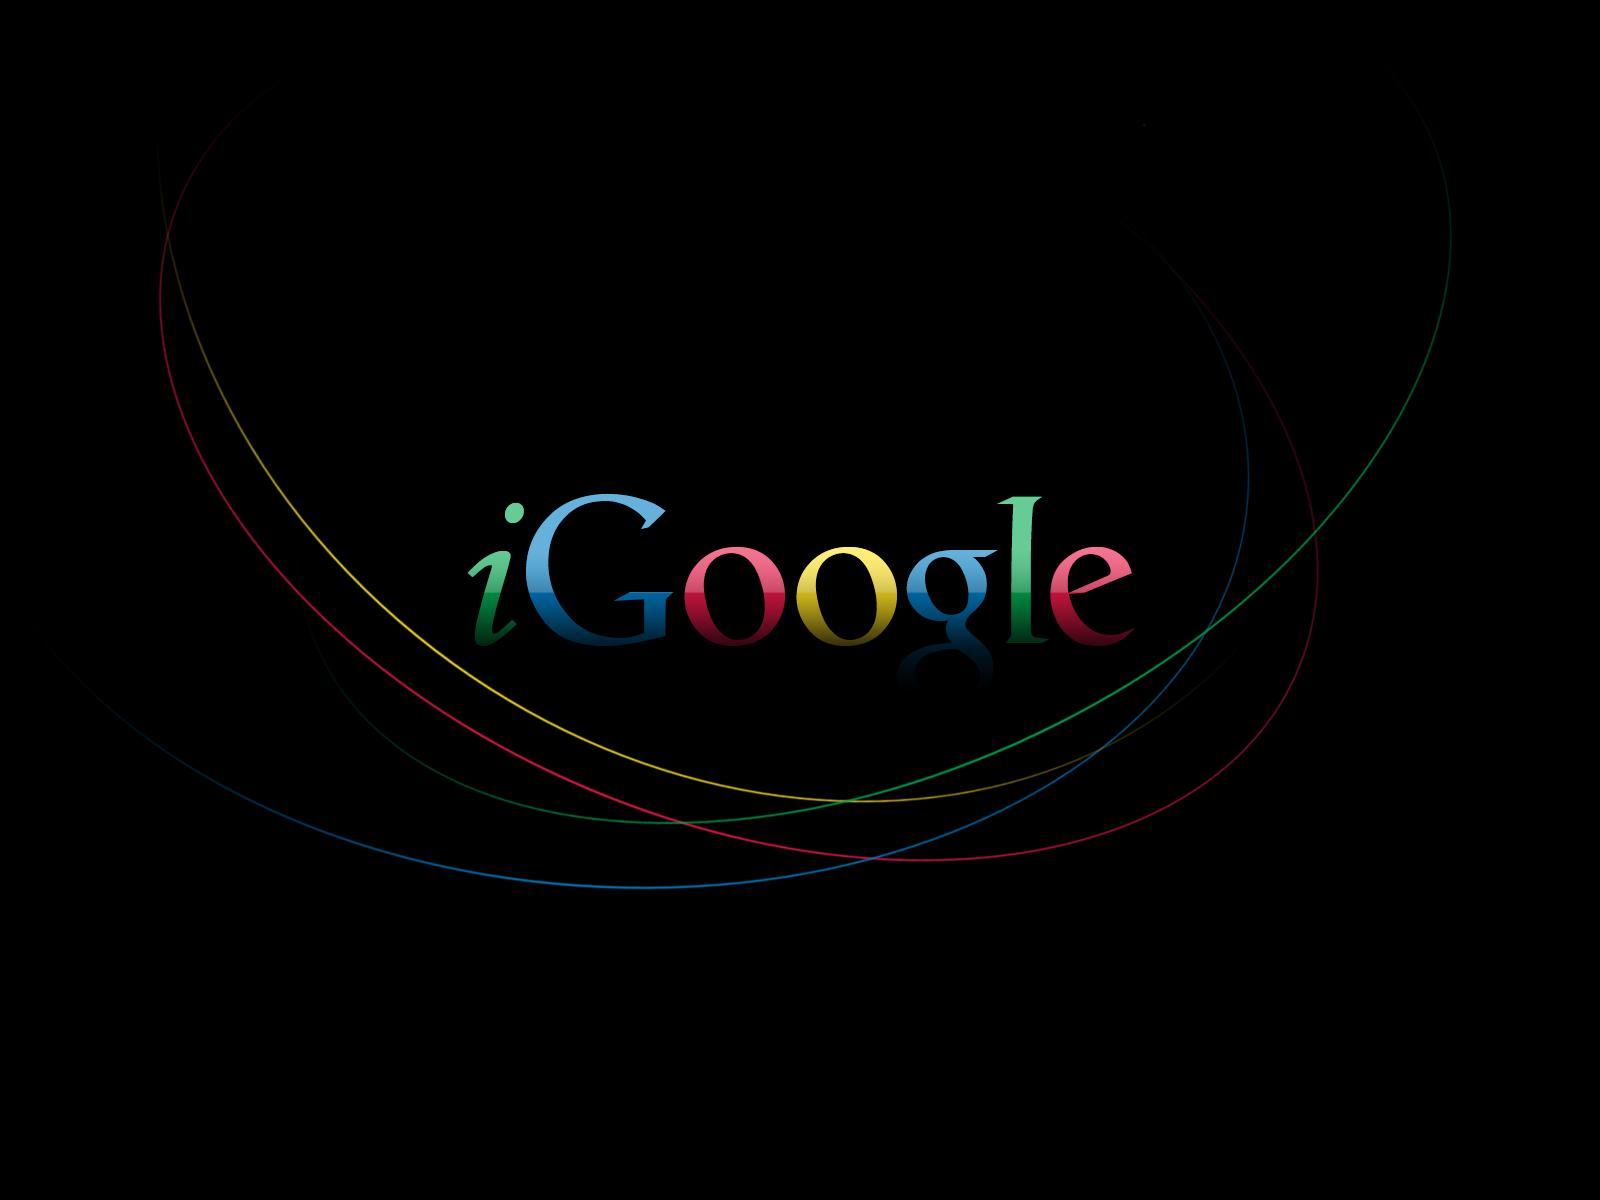 wallpapers hd google wallpaper picture image wallpaper dekstop google 1600x1200